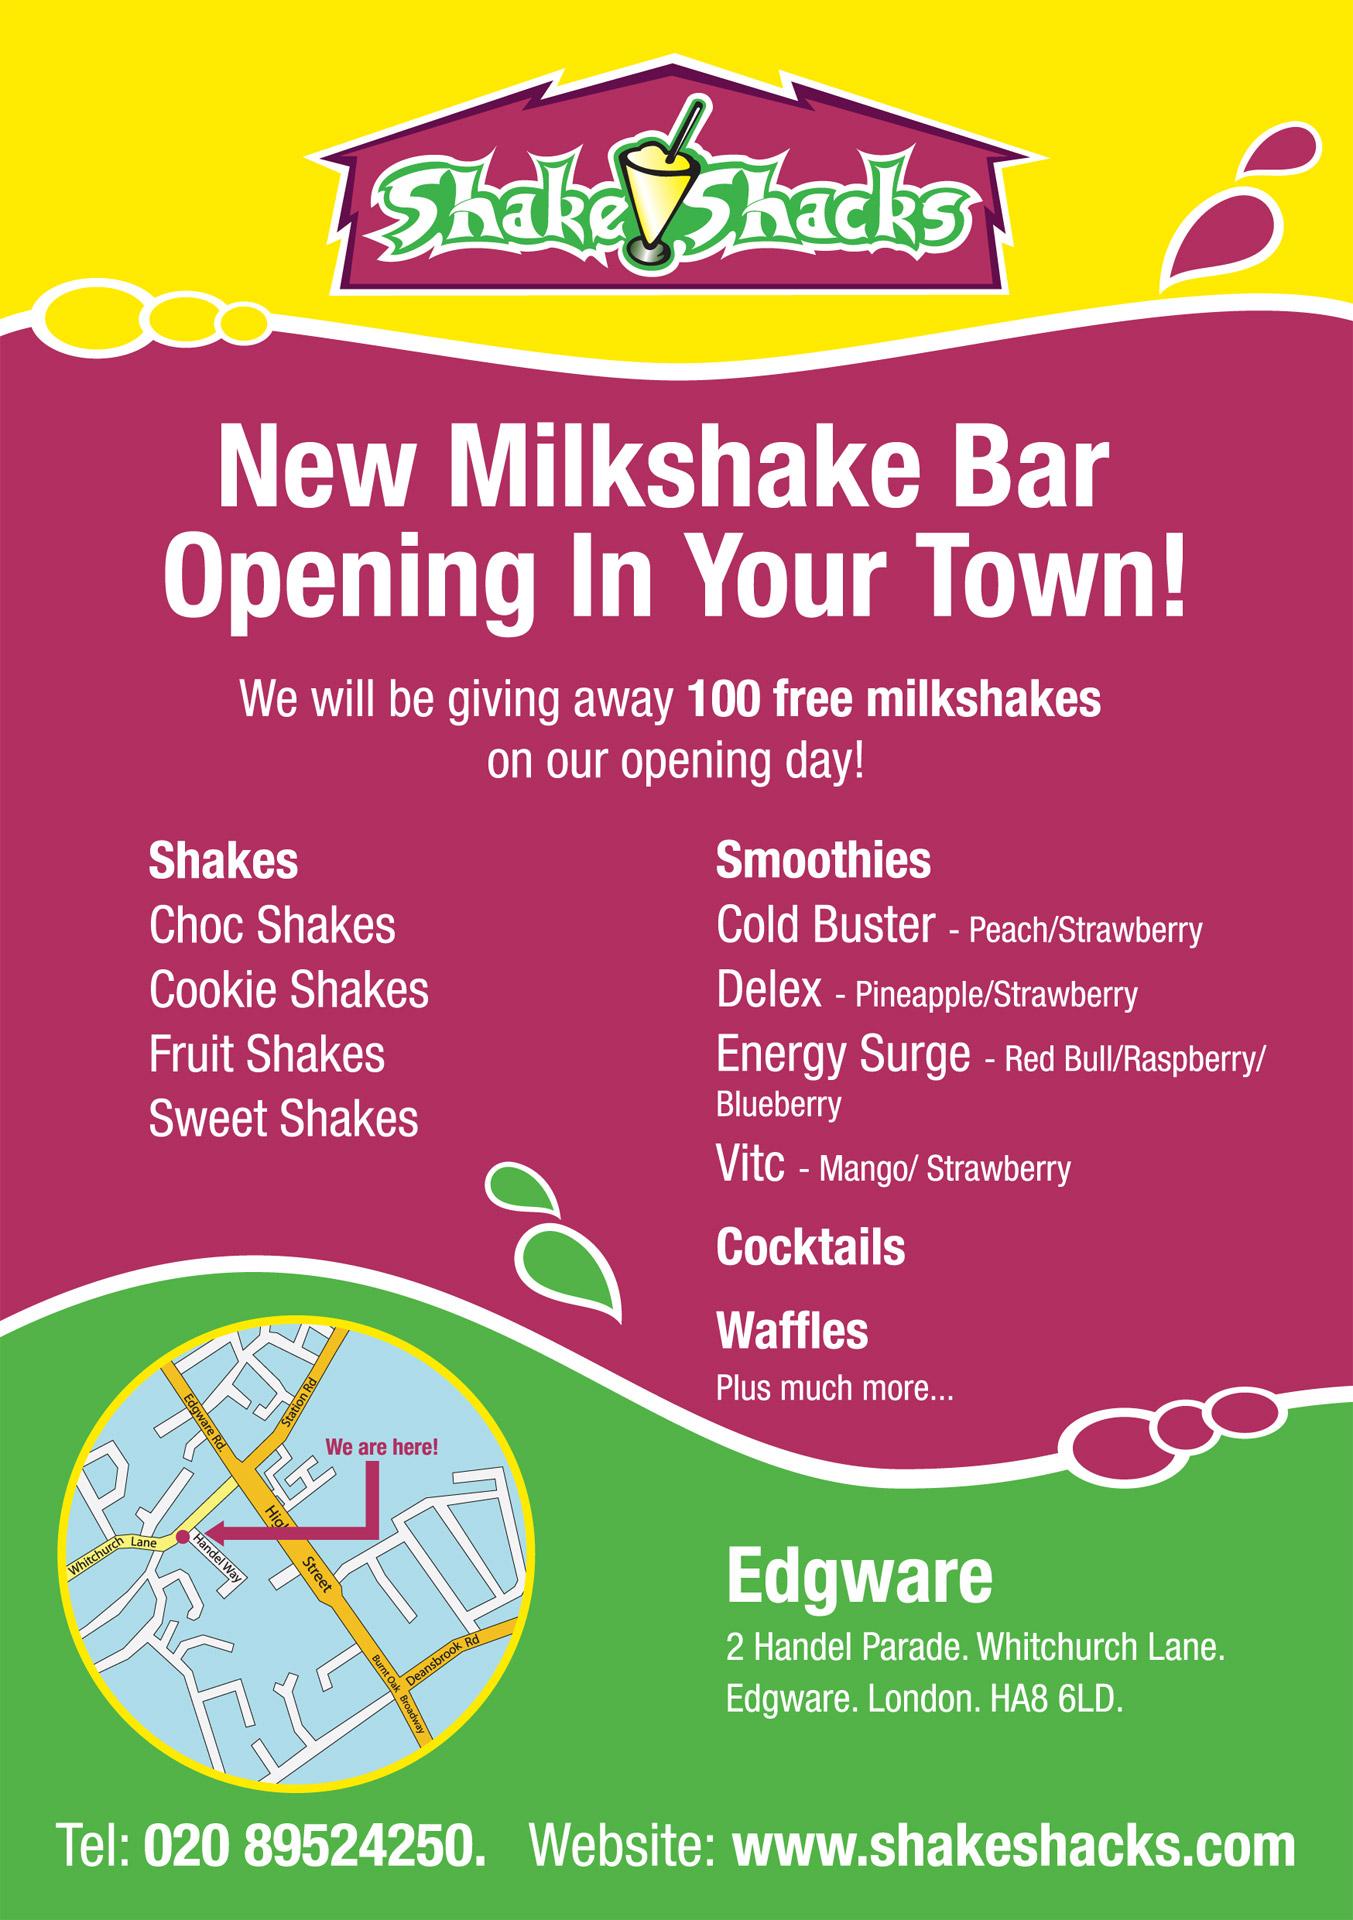 Shakeshacks A5 flyer